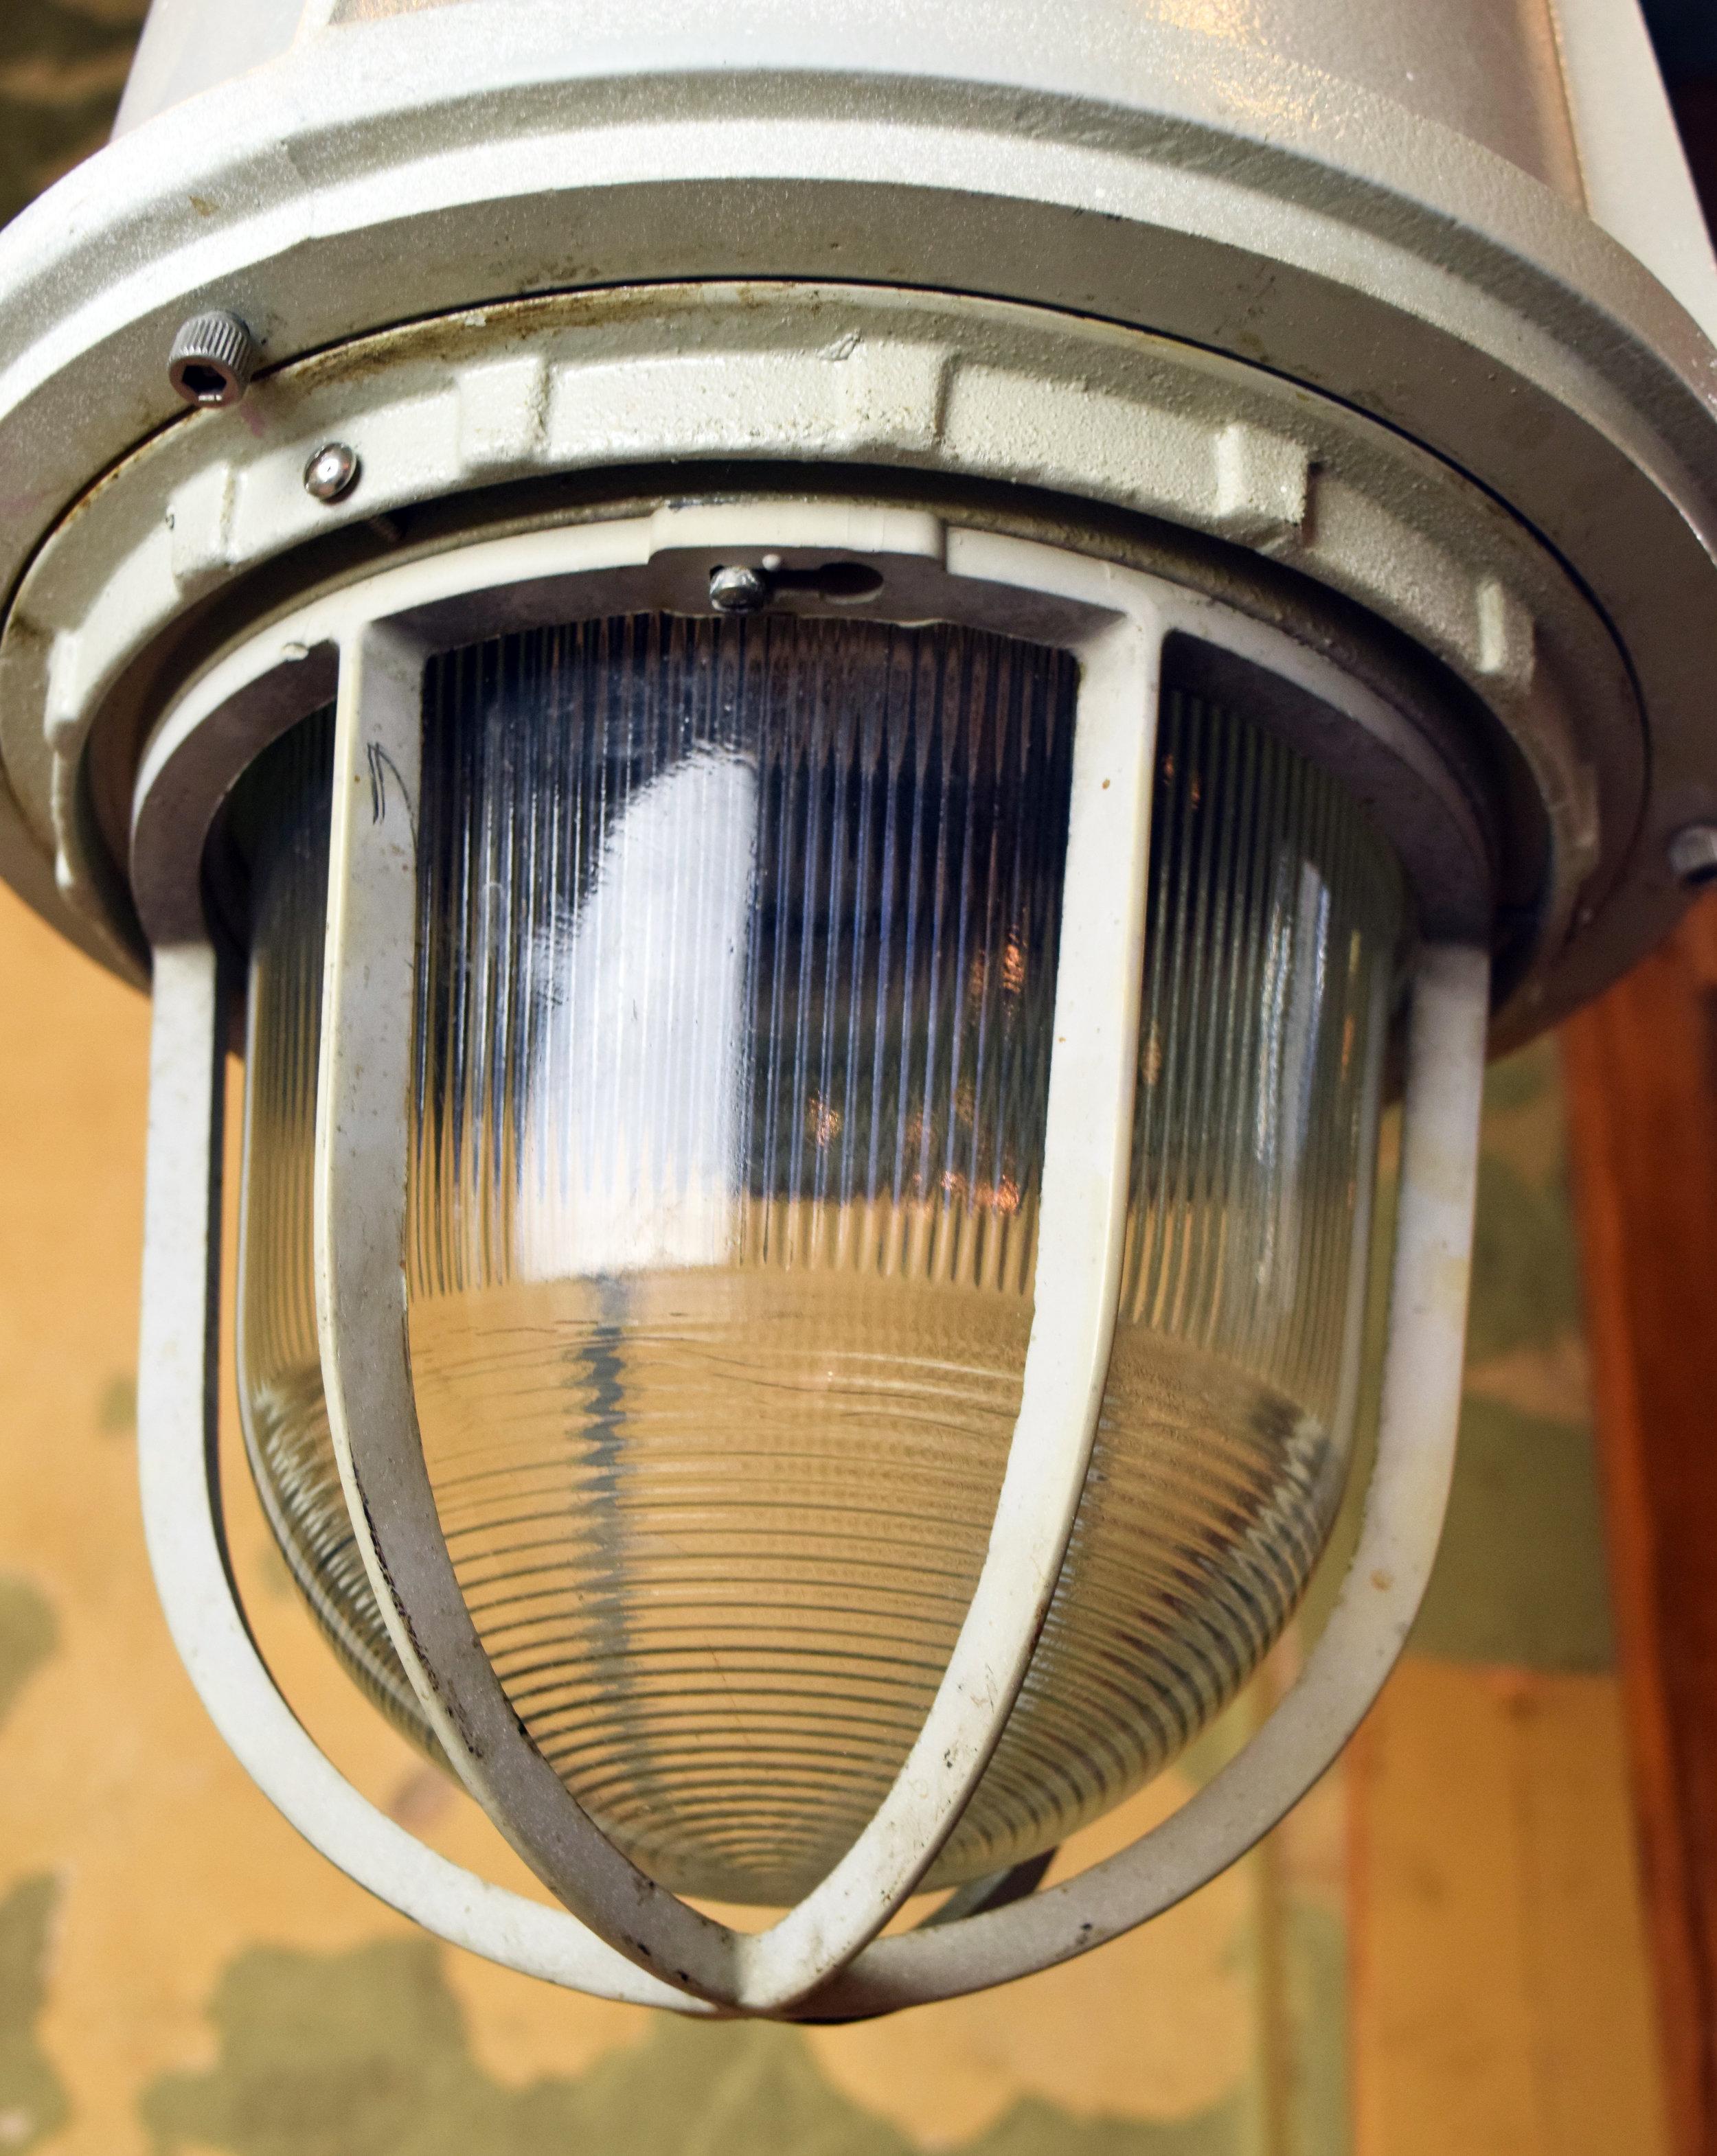 45513-explosion-proof-fixture-detail bulb.JPG